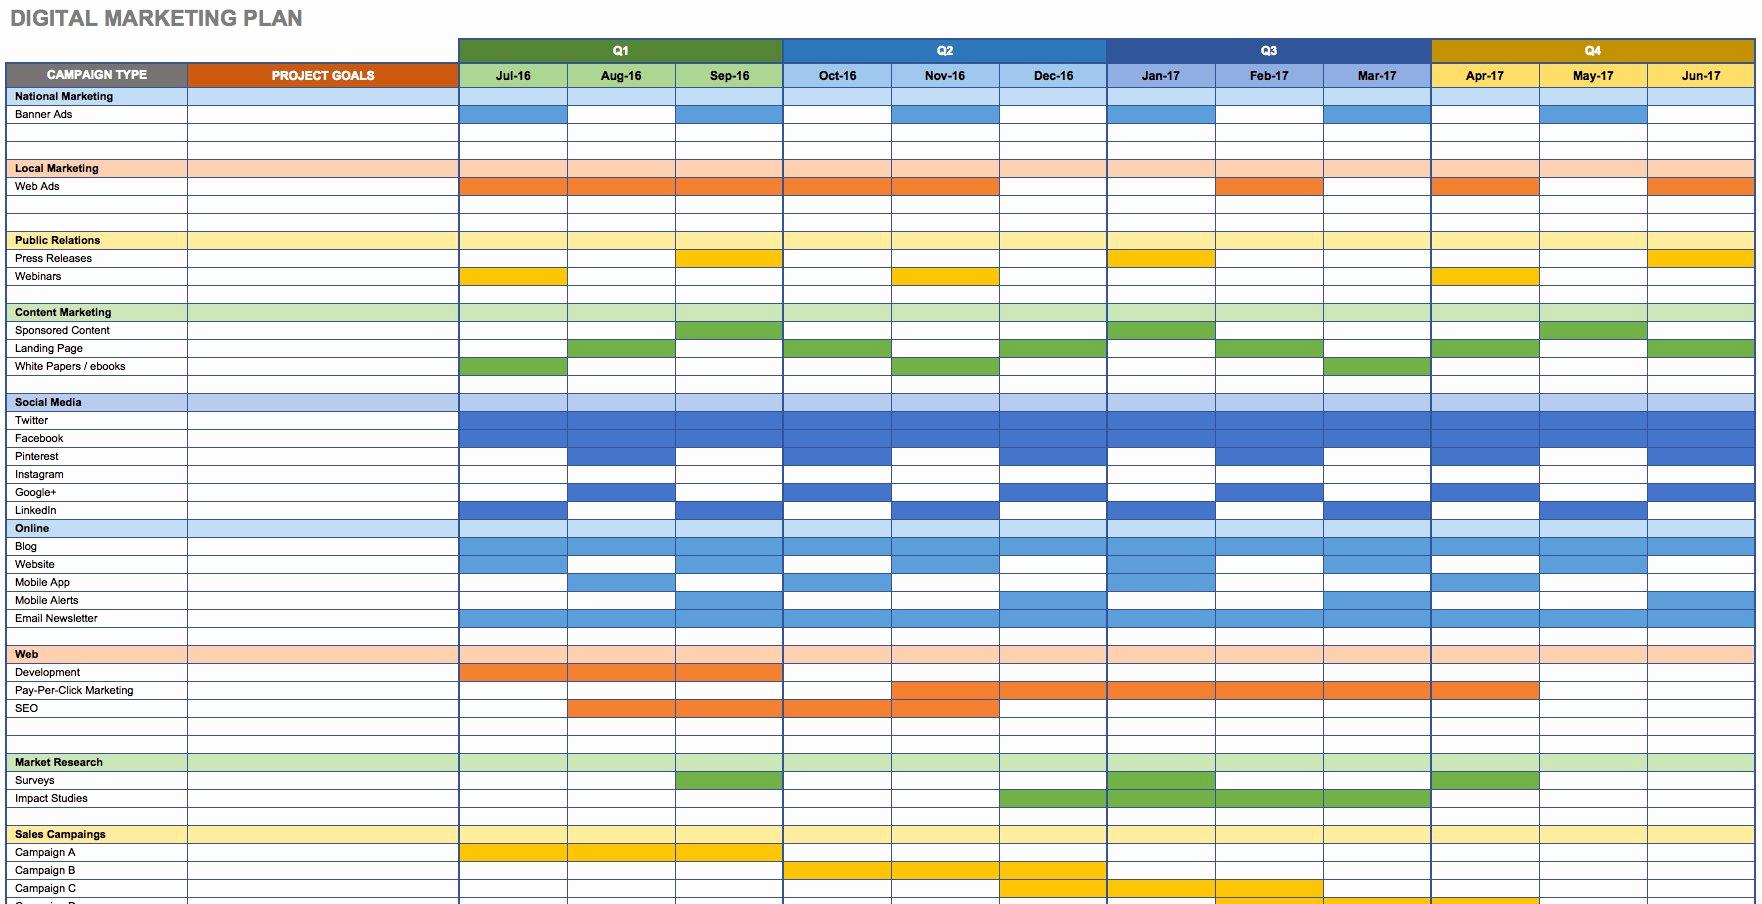 Digital Marketing Plan Template Awesome Free Marketing Plan Templates for Excel Smartsheet